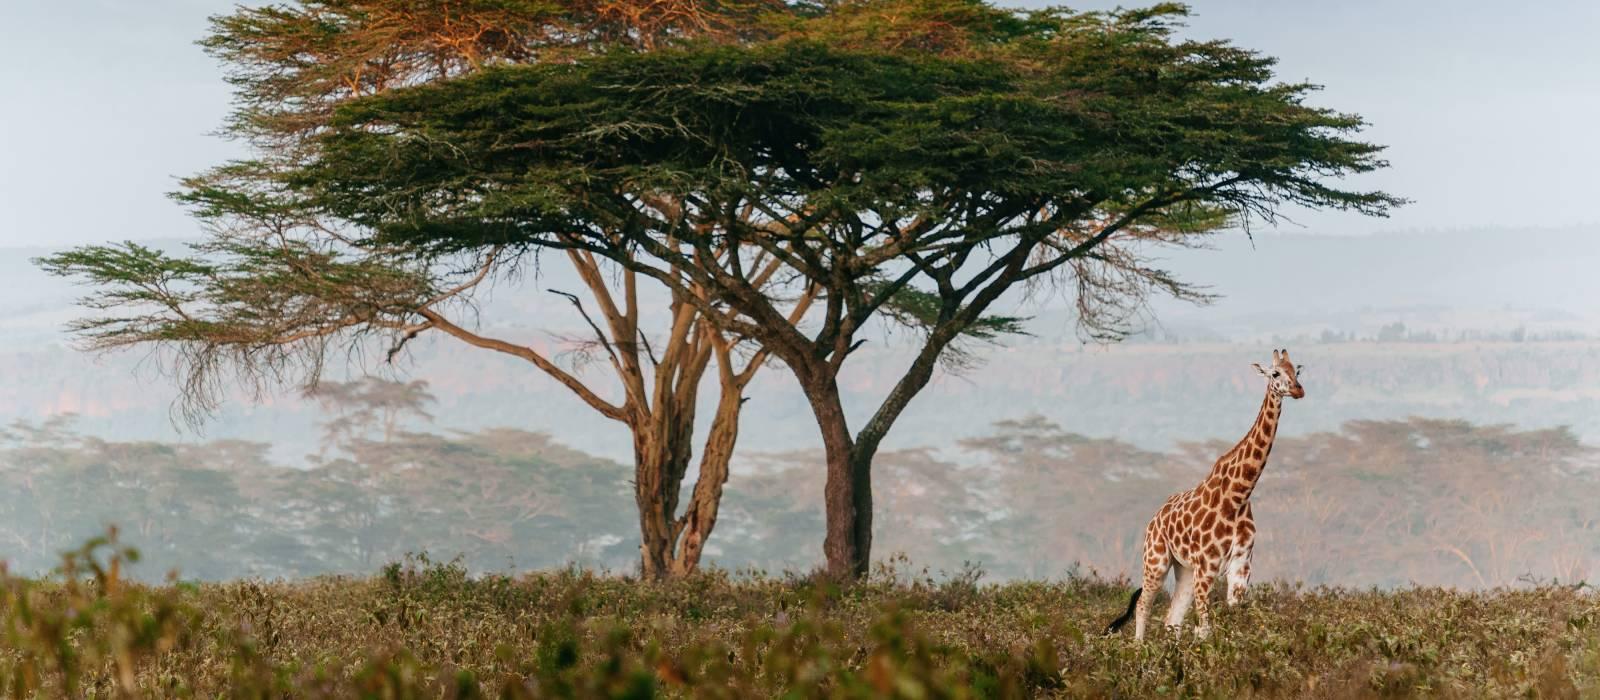 roaming giraffe, South Africa